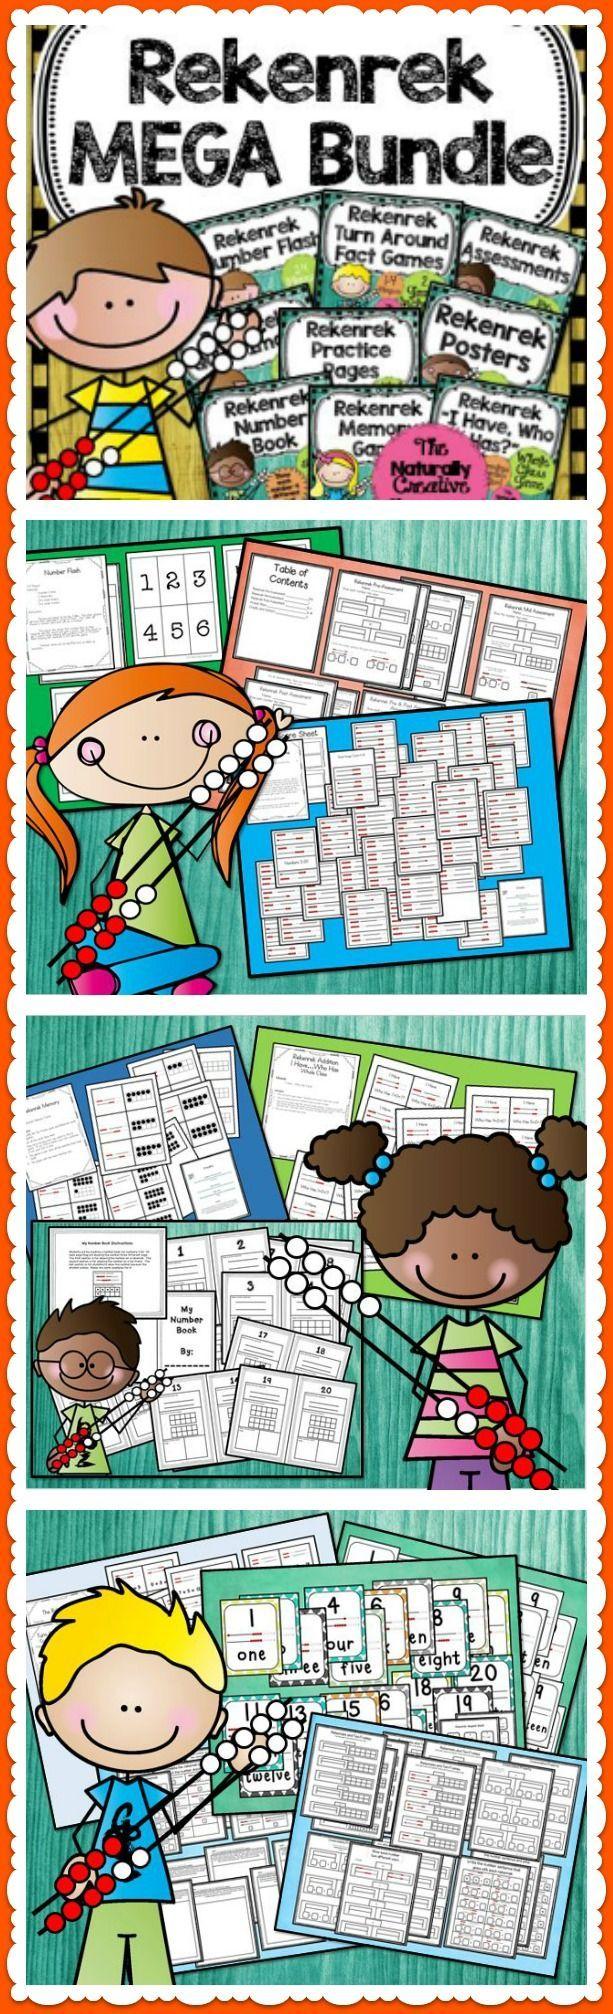 501 best Elementary Math images on Pinterest | 4th grade math, Basic ...